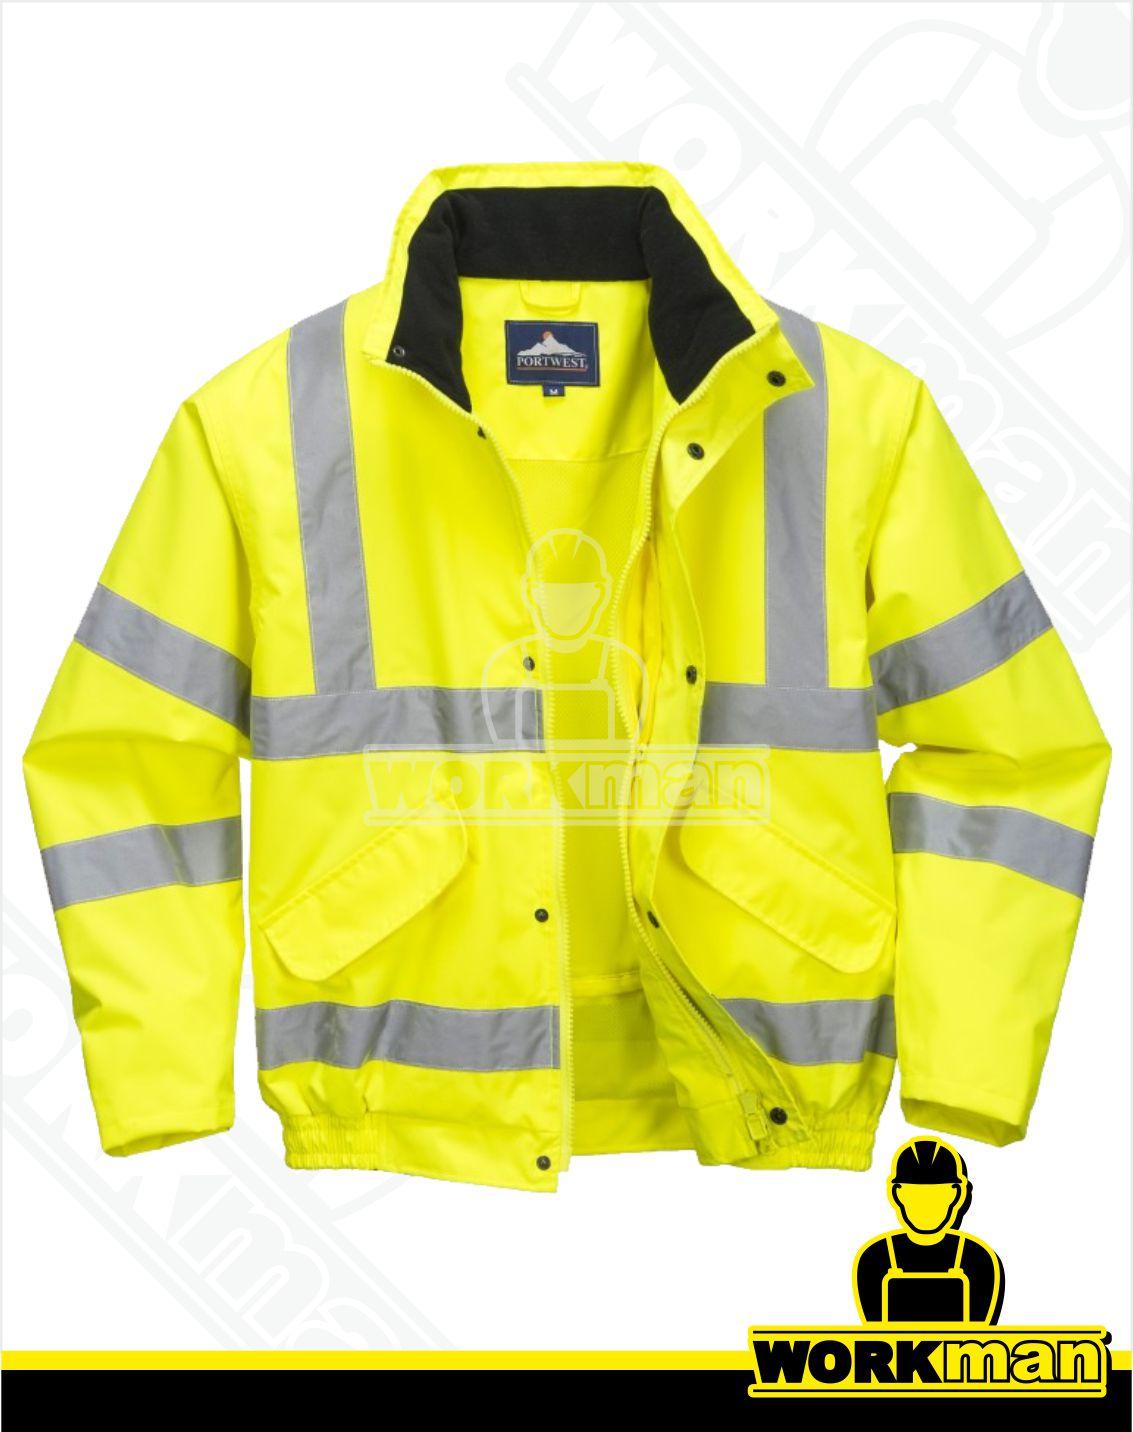 99d8f0e4f4c1 Reflexná bunda Hi-vis BOMBER RT62 Portwest žltá Pracovné odevy WORKMAN